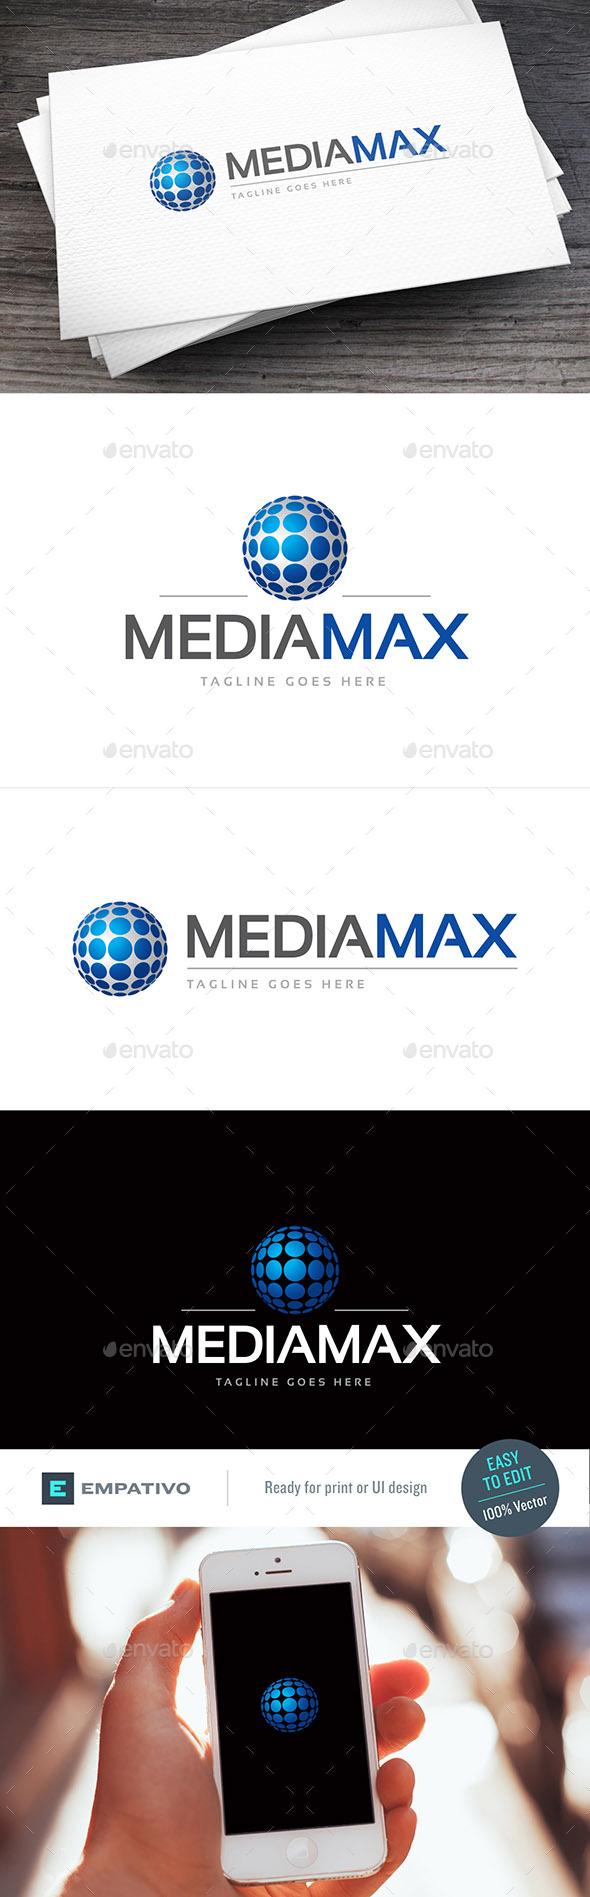 Mediamax Logo Template